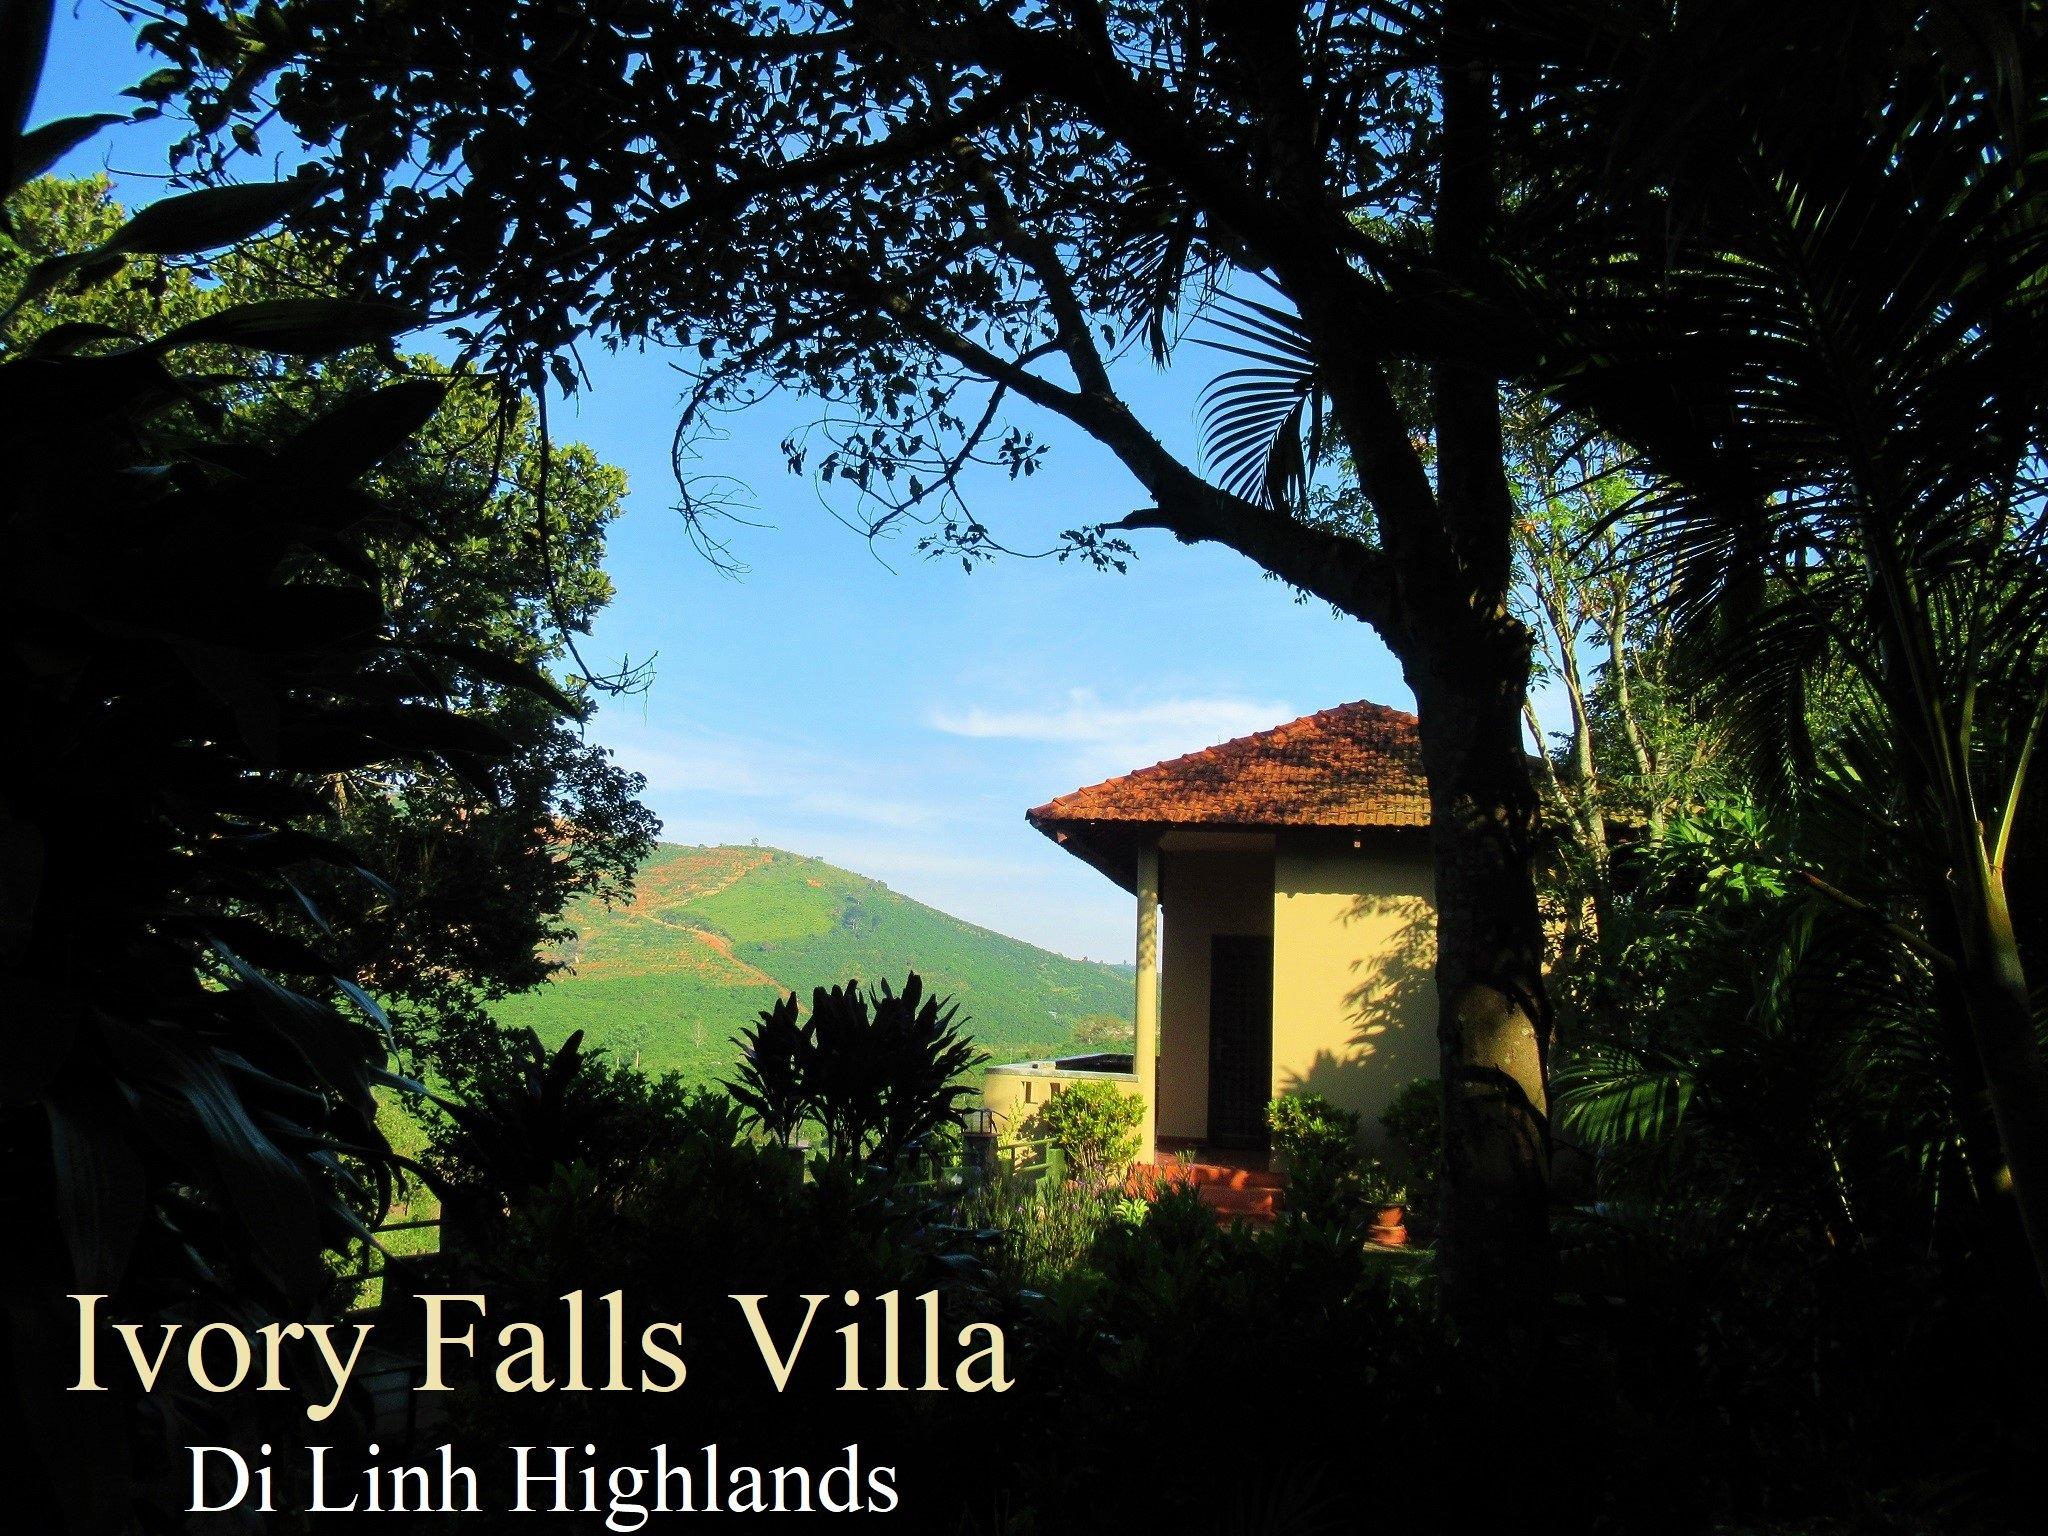 Ivory Falls Villa Resort, Di Linh Highlands, Vietnam